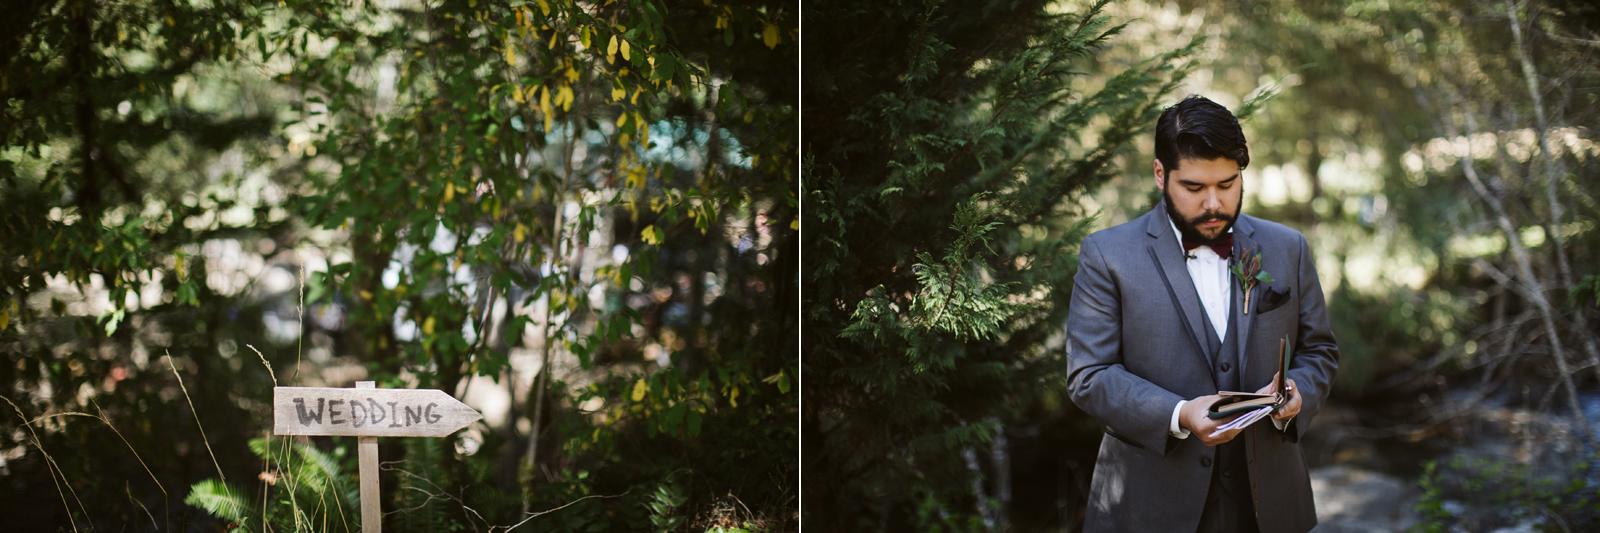 072-daronjackson-jason-mckensie-rebers-riverside.jpg